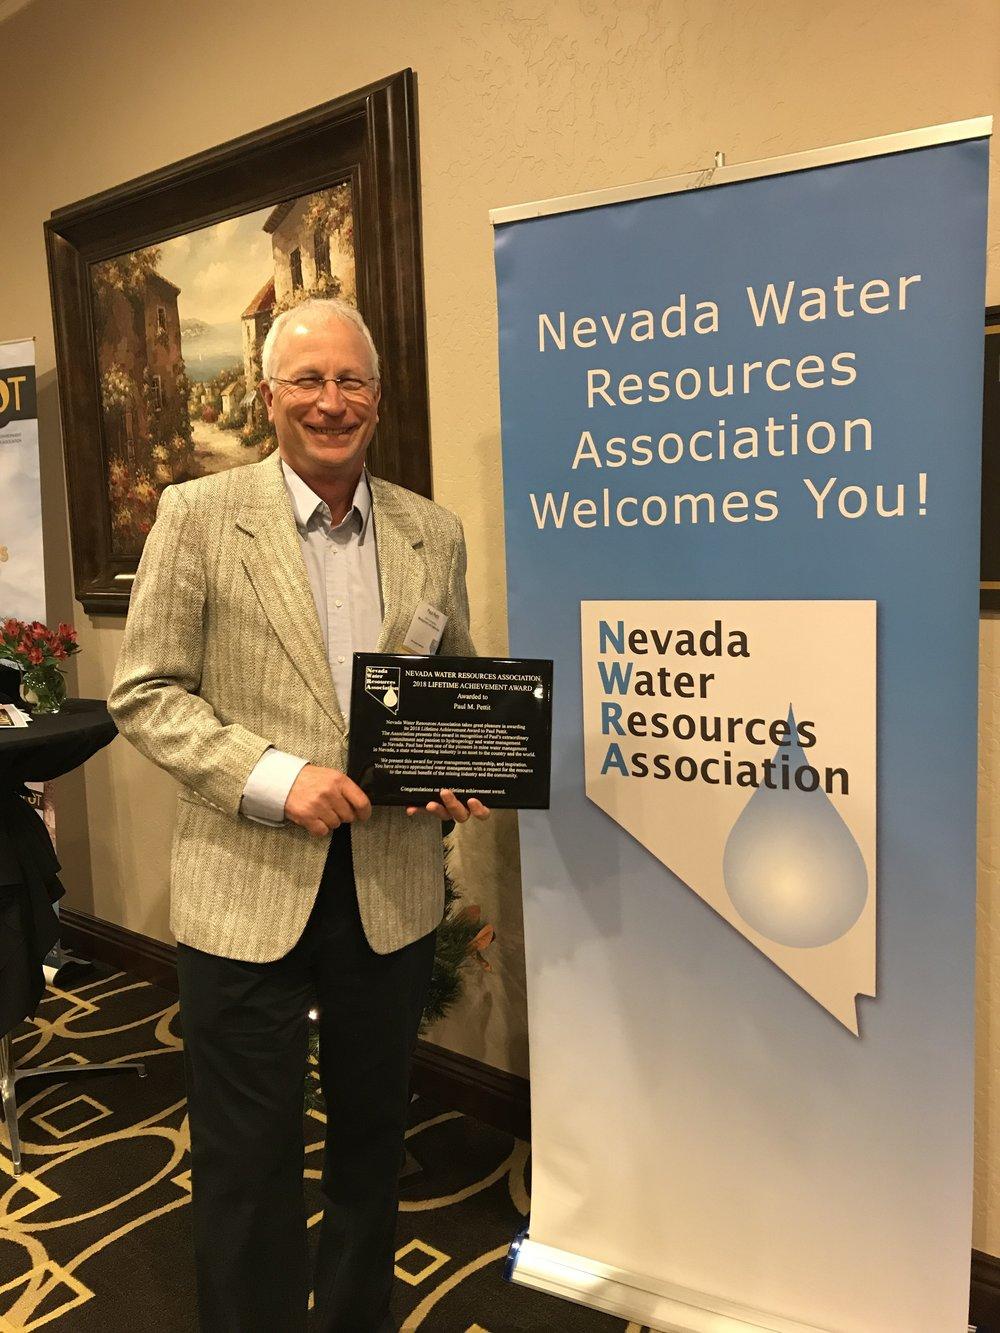 2018 NWRA Lifetime achievement award winner, mr. paul pettit!  Read more here.